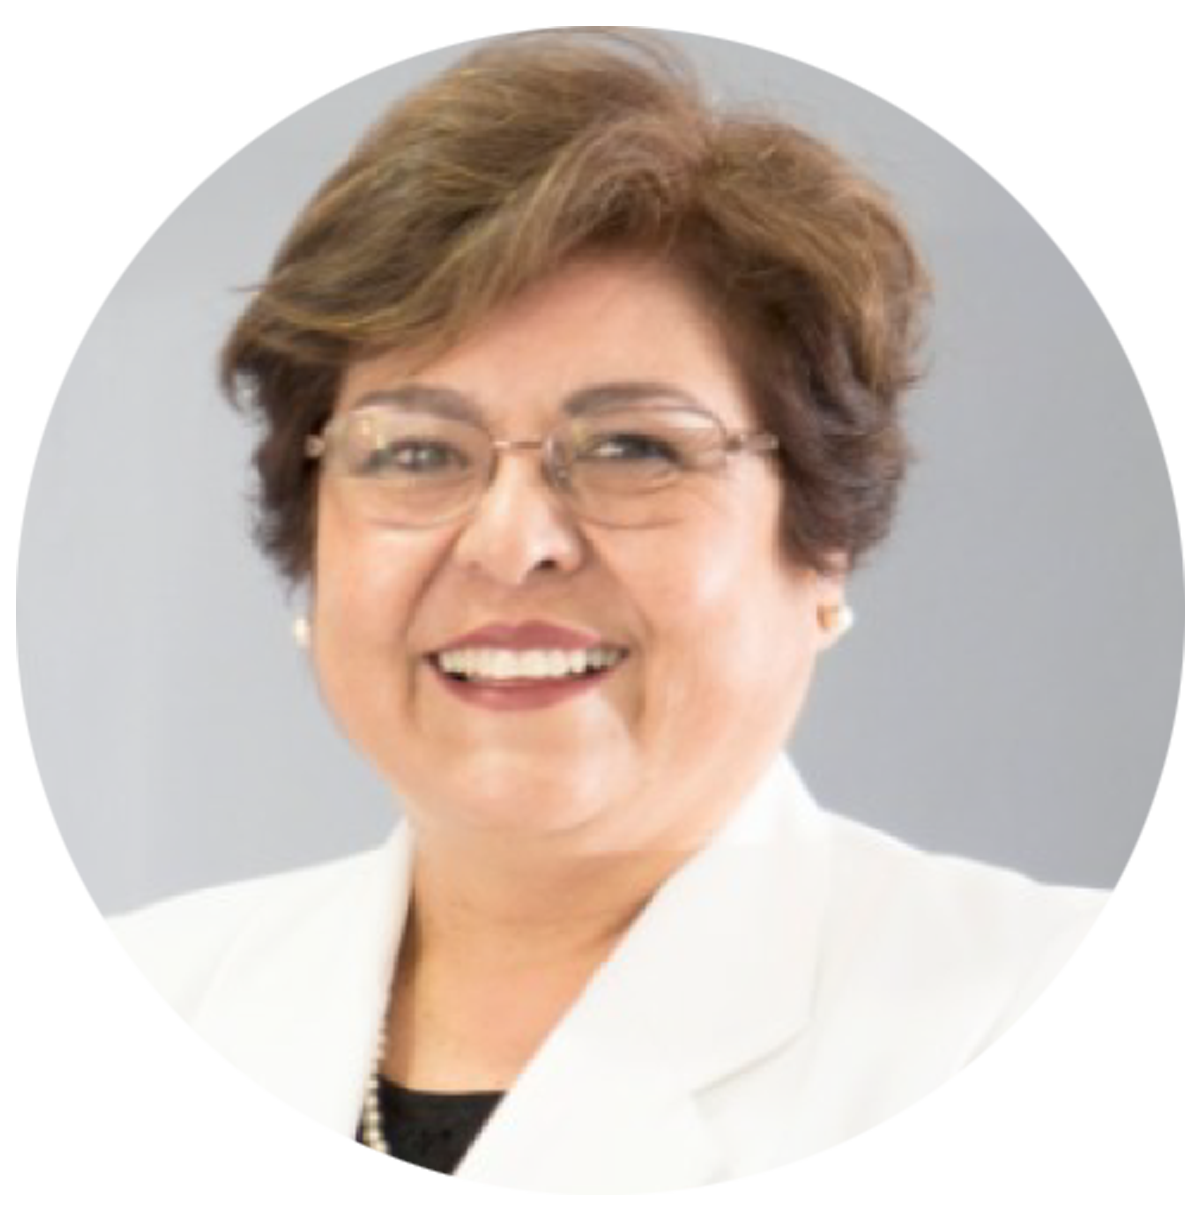 Ana María Llerena Oviedo